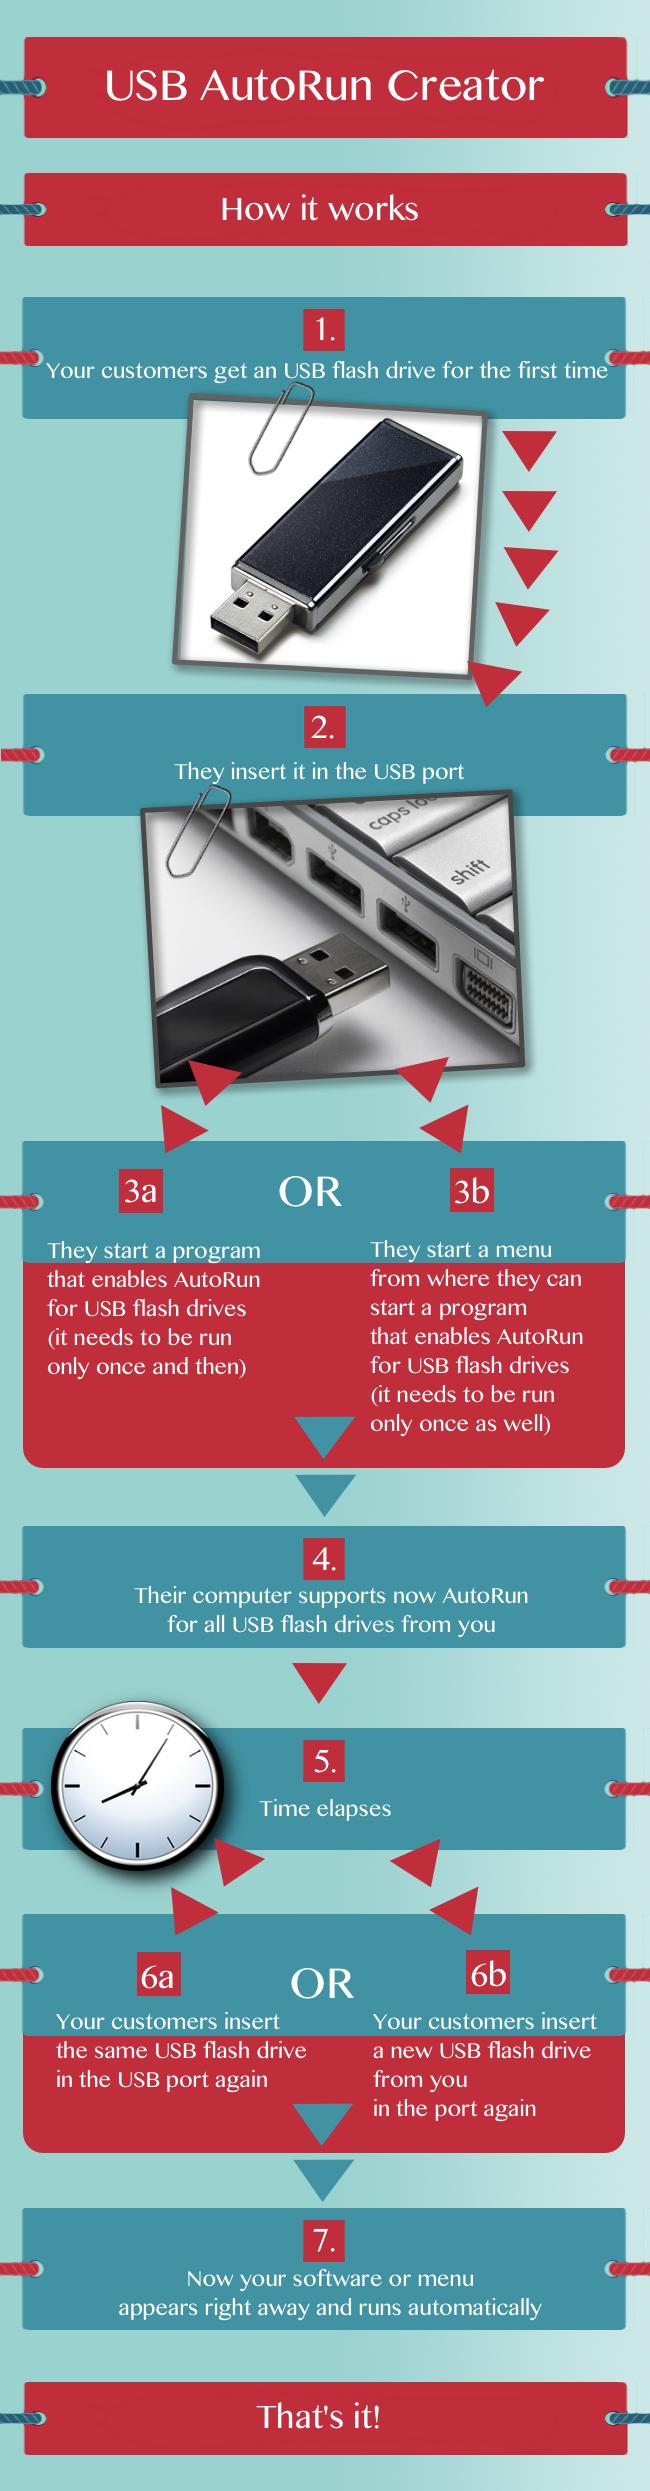 Infograf - USB AutoRun Creator